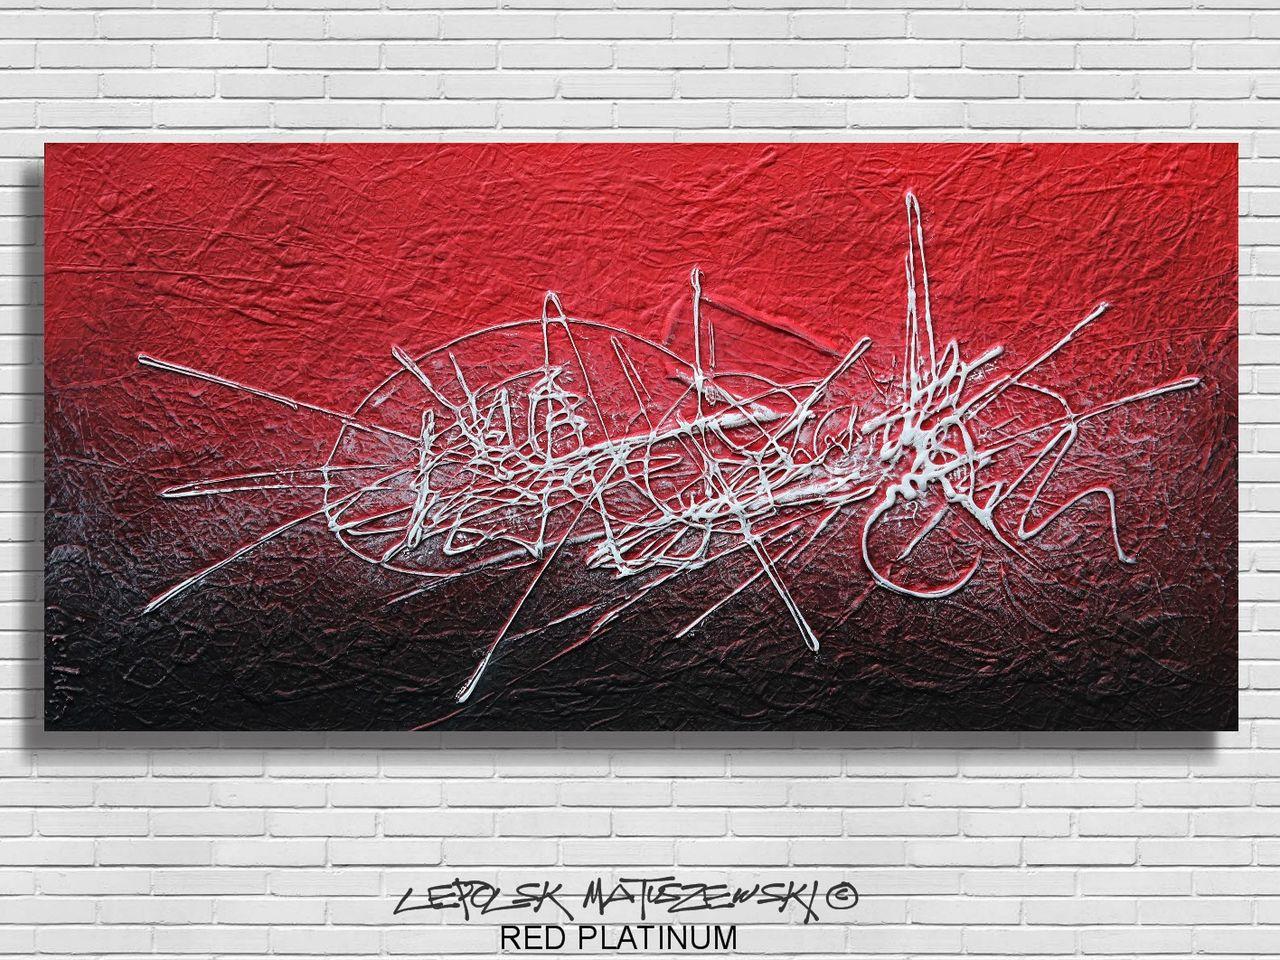 MISTER K  (Lepolsk Matuszewski) RED PLATINUM   (expressionnisme abstrait contemporain)